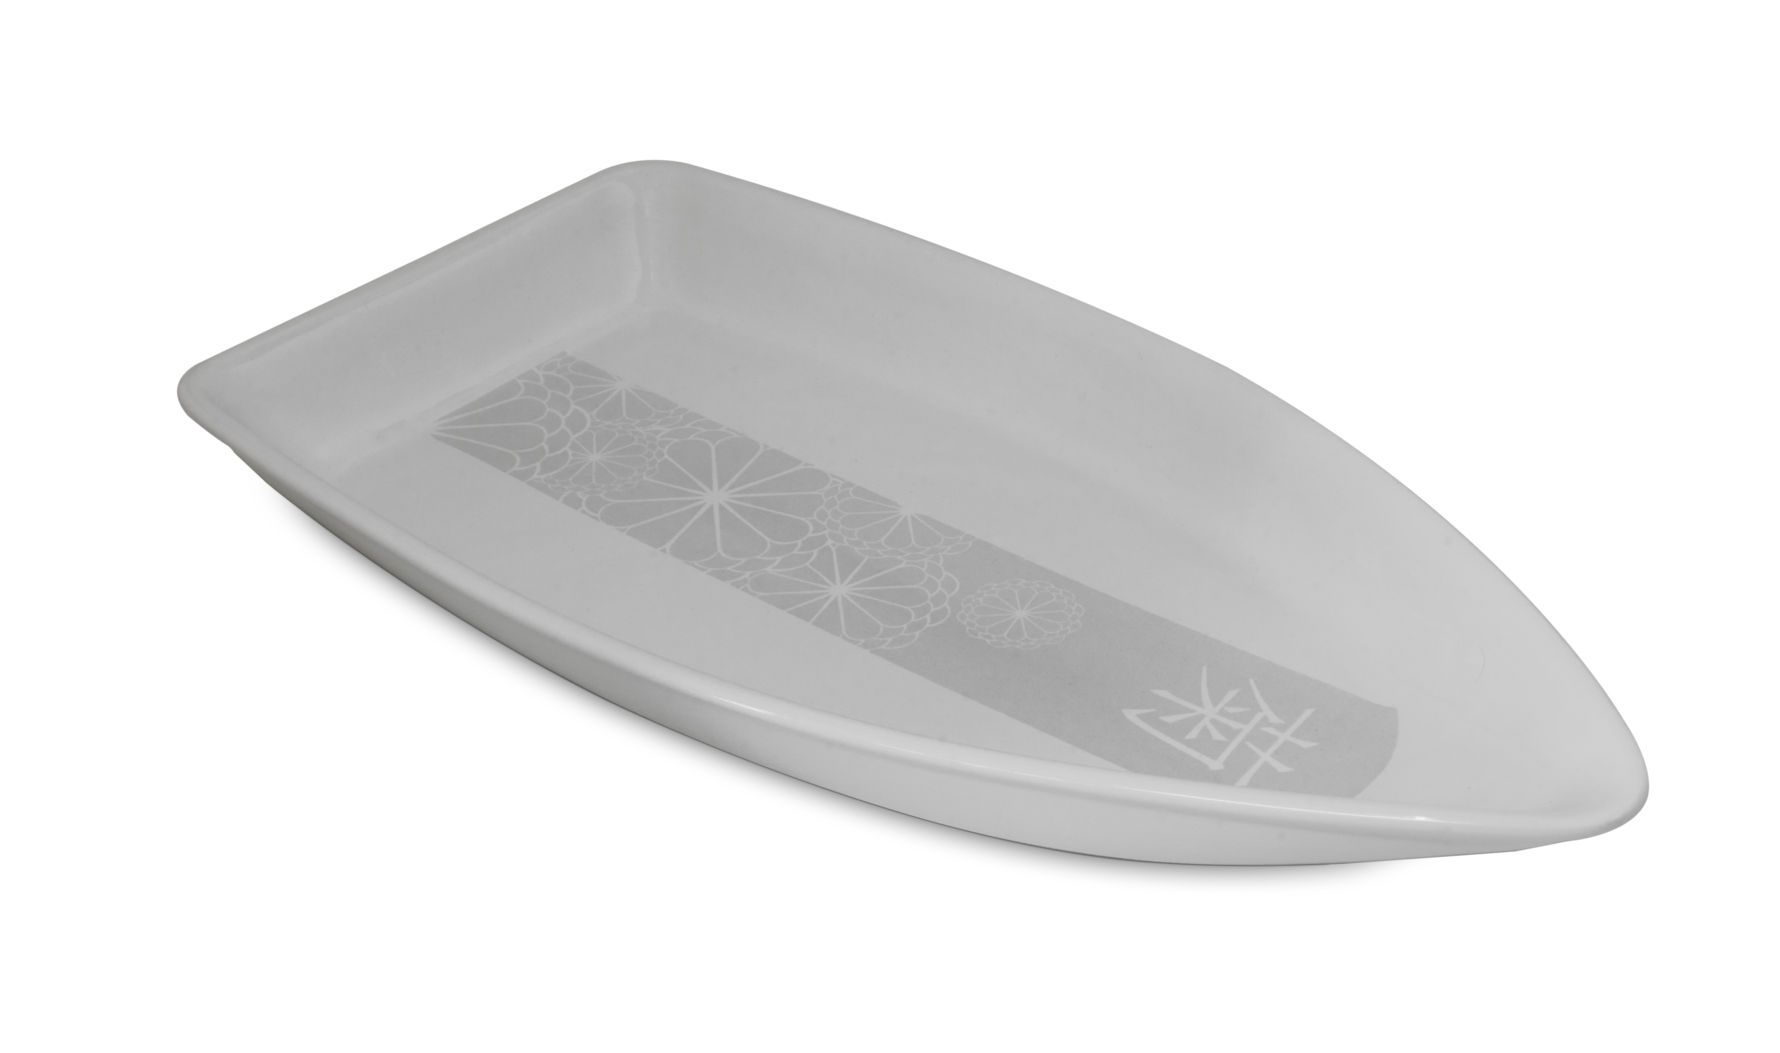 Barco 32,5 x 17 x 3,0 cm Cerâmica Linha Matsuri Branco